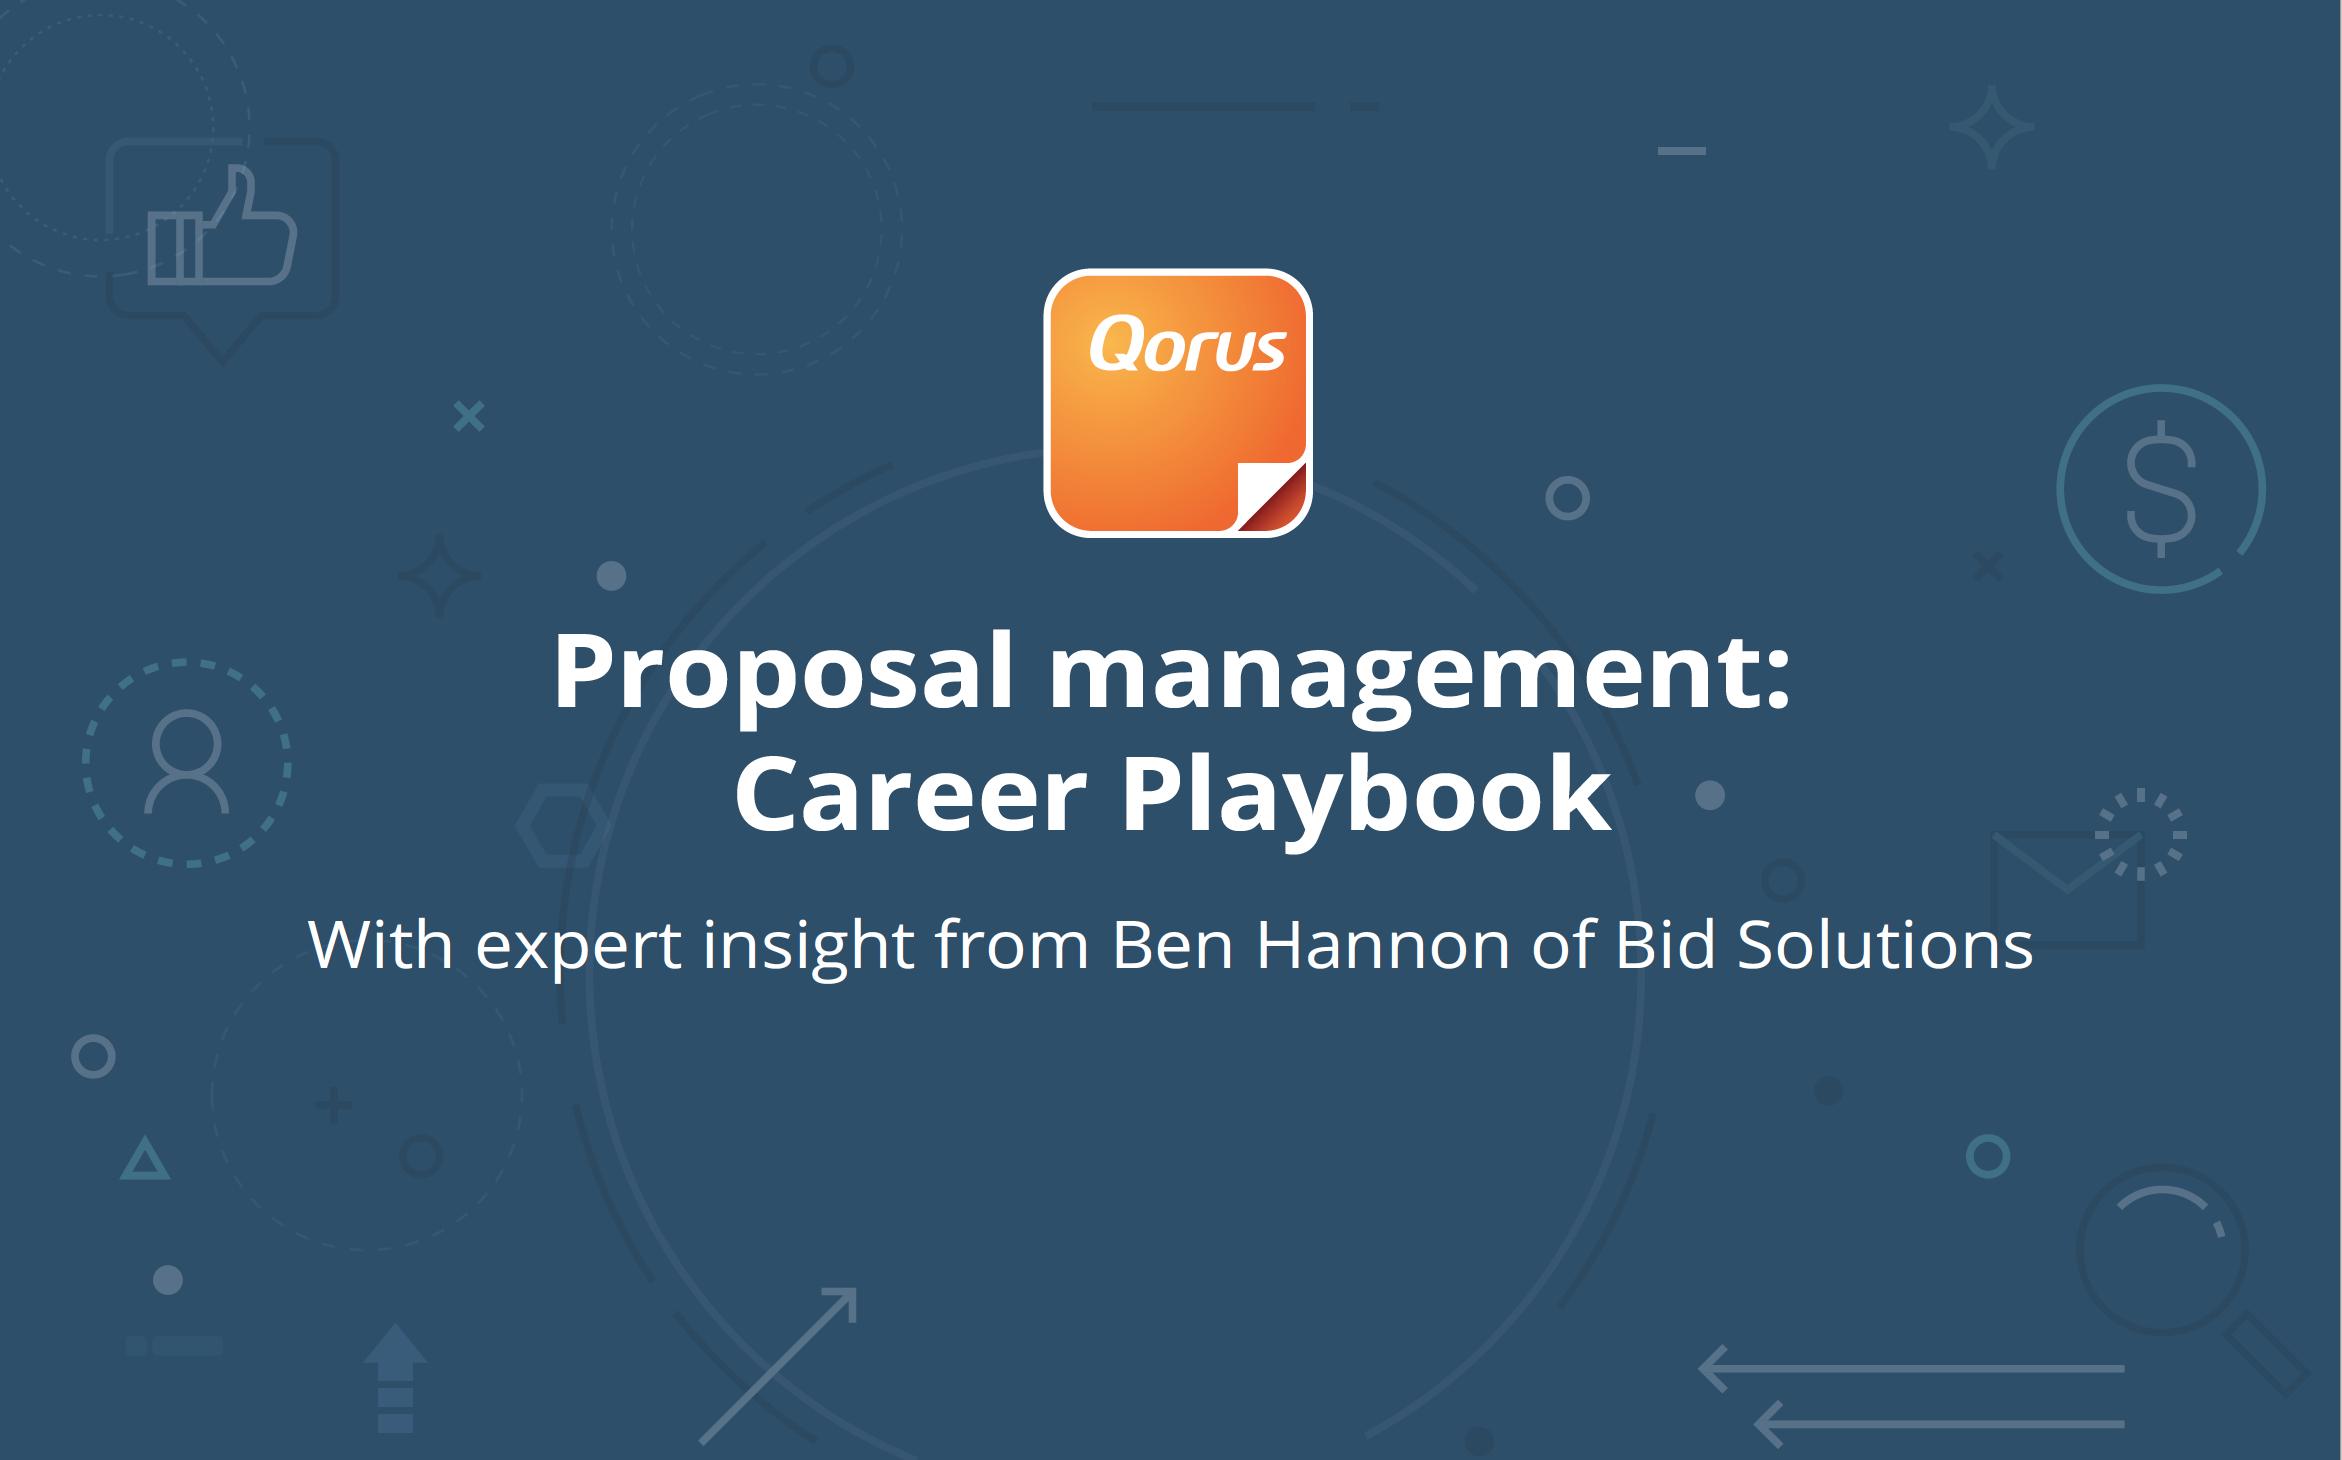 Proposal Management: Career Playbook